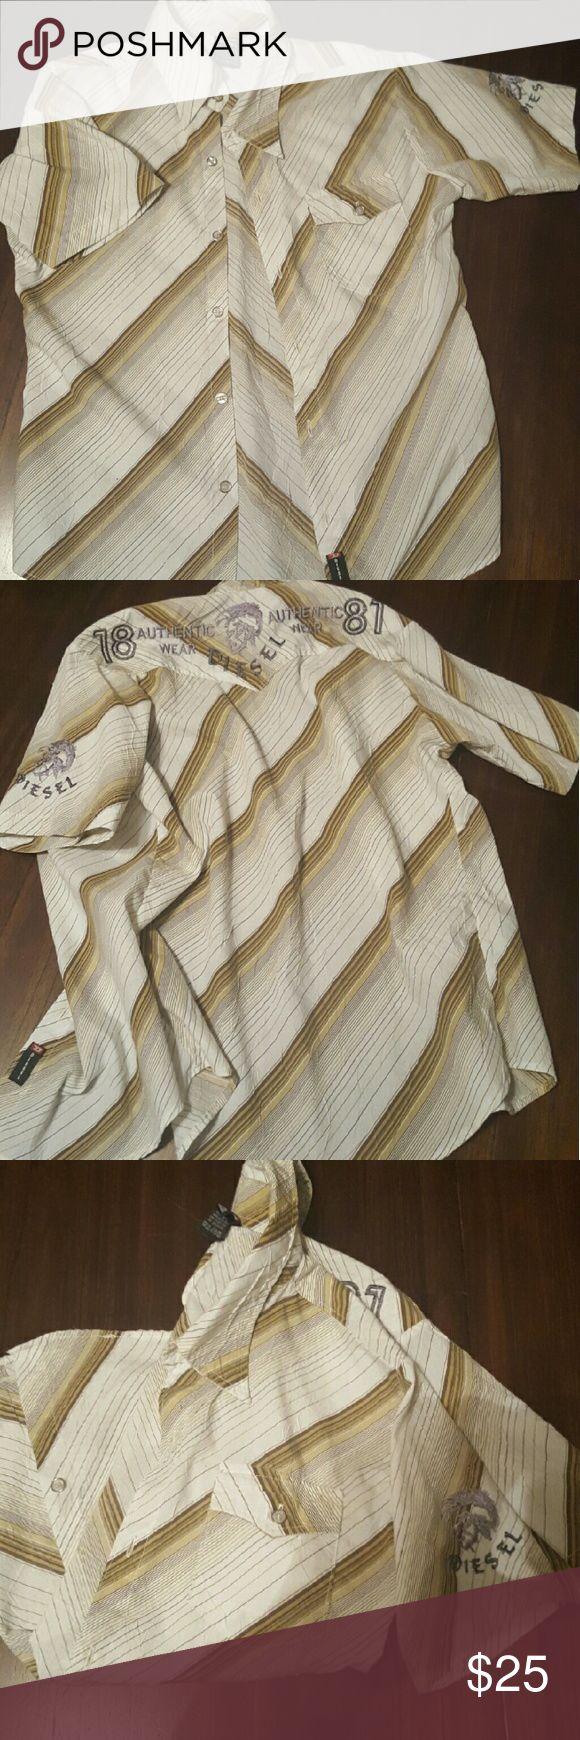 Diesel men's button-down Short sleeve striped men's button-down diesel shirt with embroidery in good condition. Diesel Shirts Casual Button Down Shirts